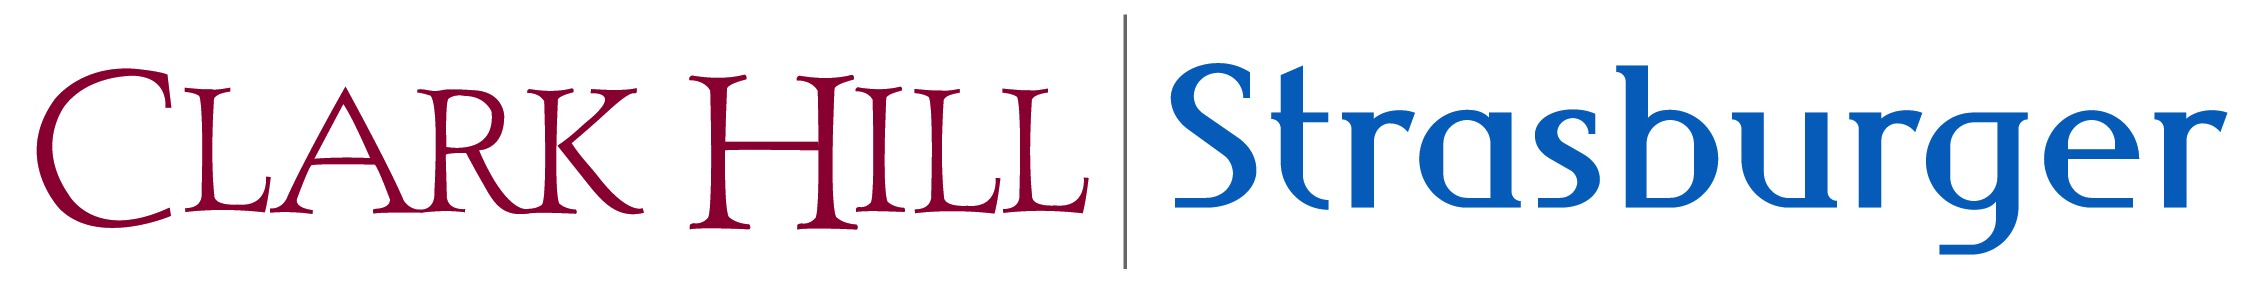 Clarkhillstrasburger logo